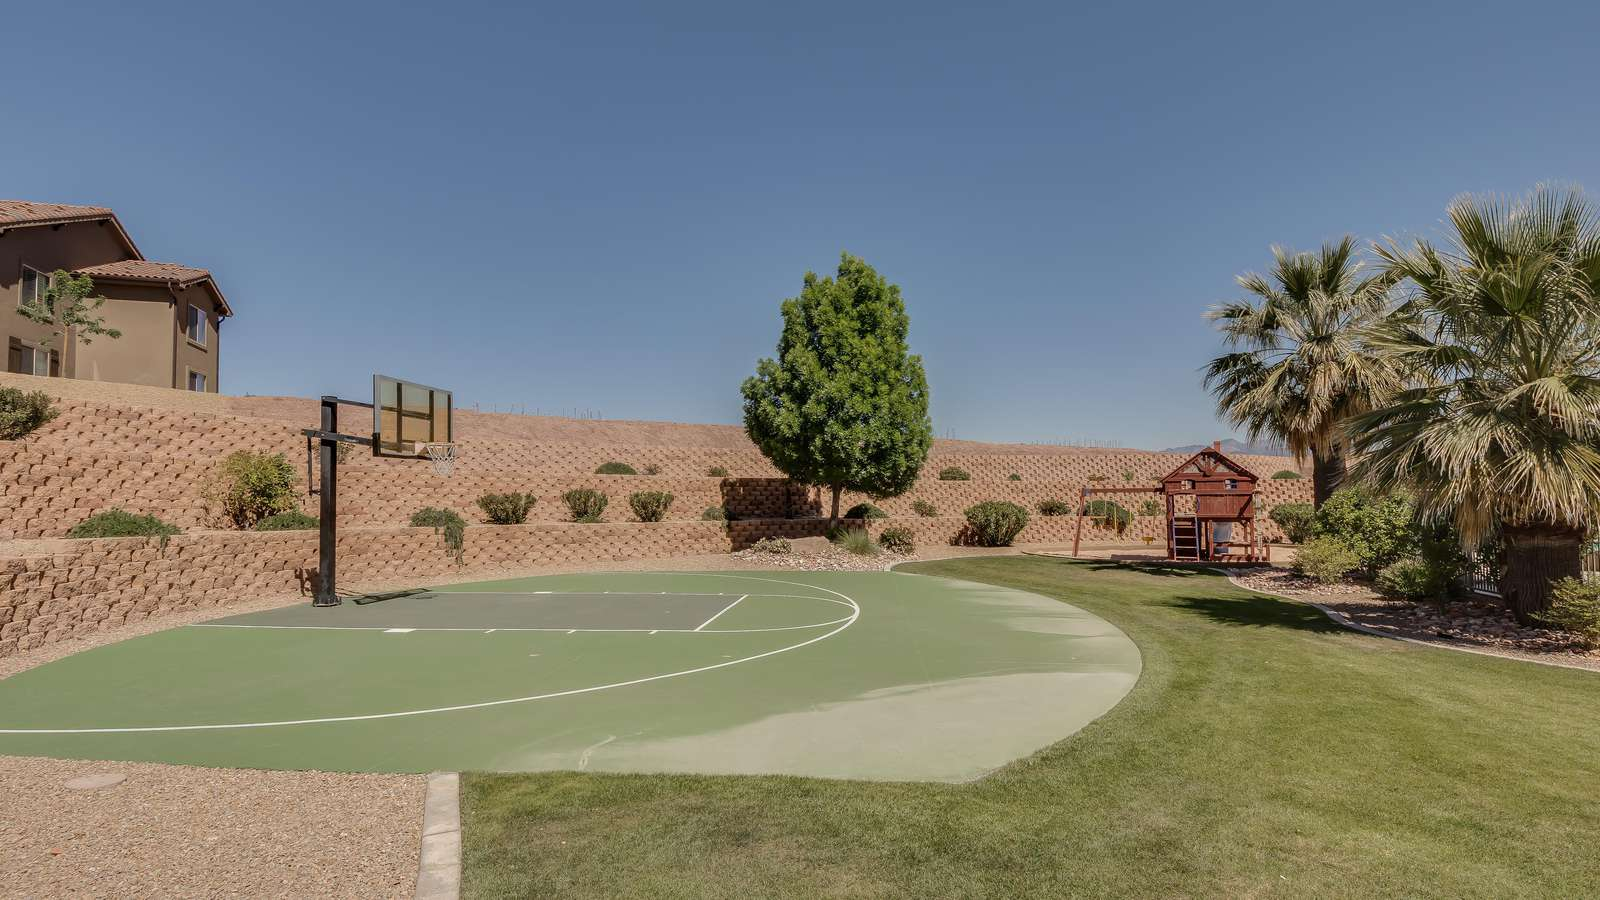 Playground/Basketball & Tennis Courts